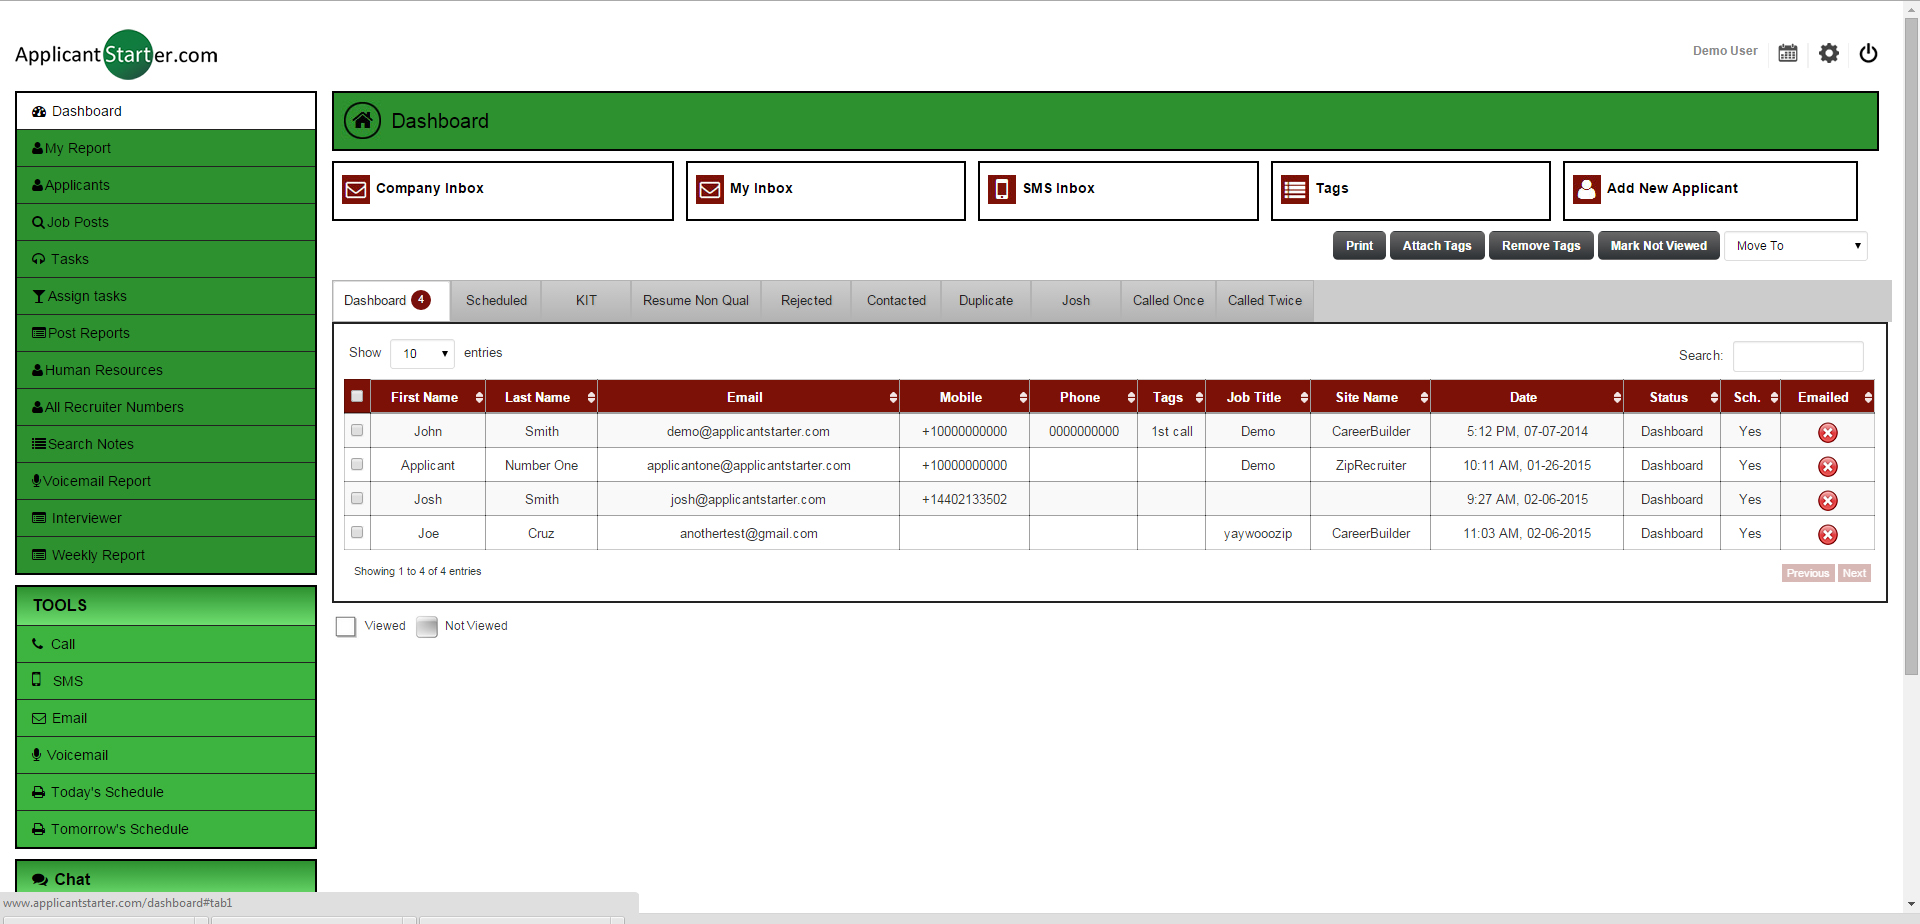 Applicant Starter Software - Dashboard